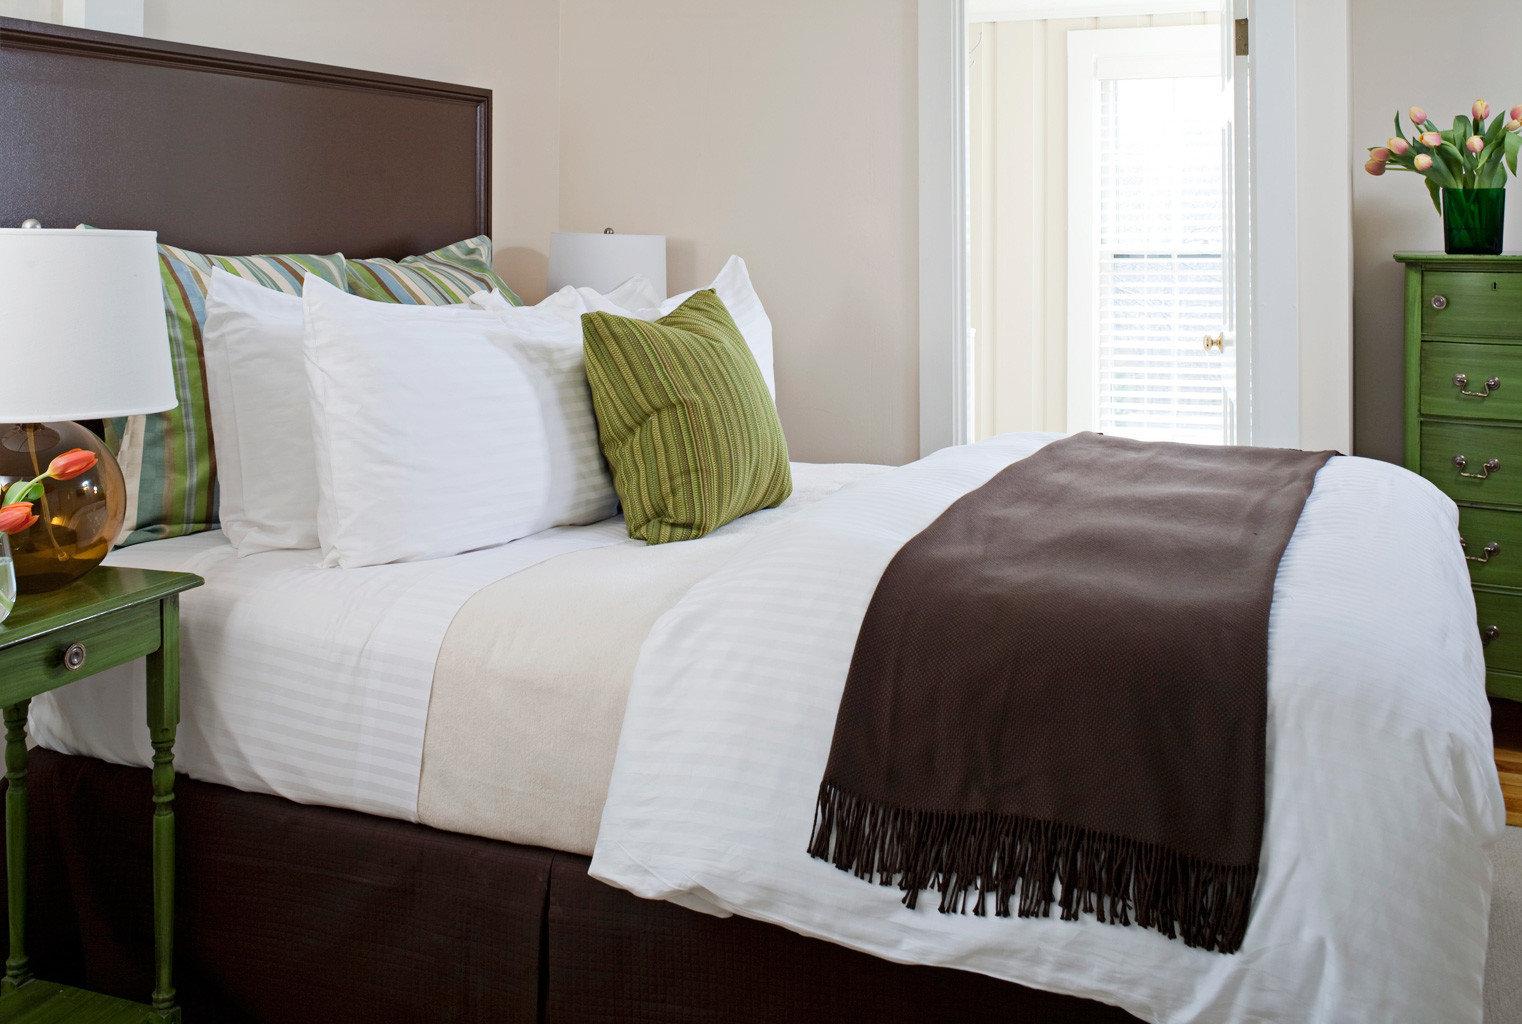 B&B Bedroom Elegant Historic Inn sofa property pillow duvet cover bed sheet textile home cottage bed frame material Suite lamp